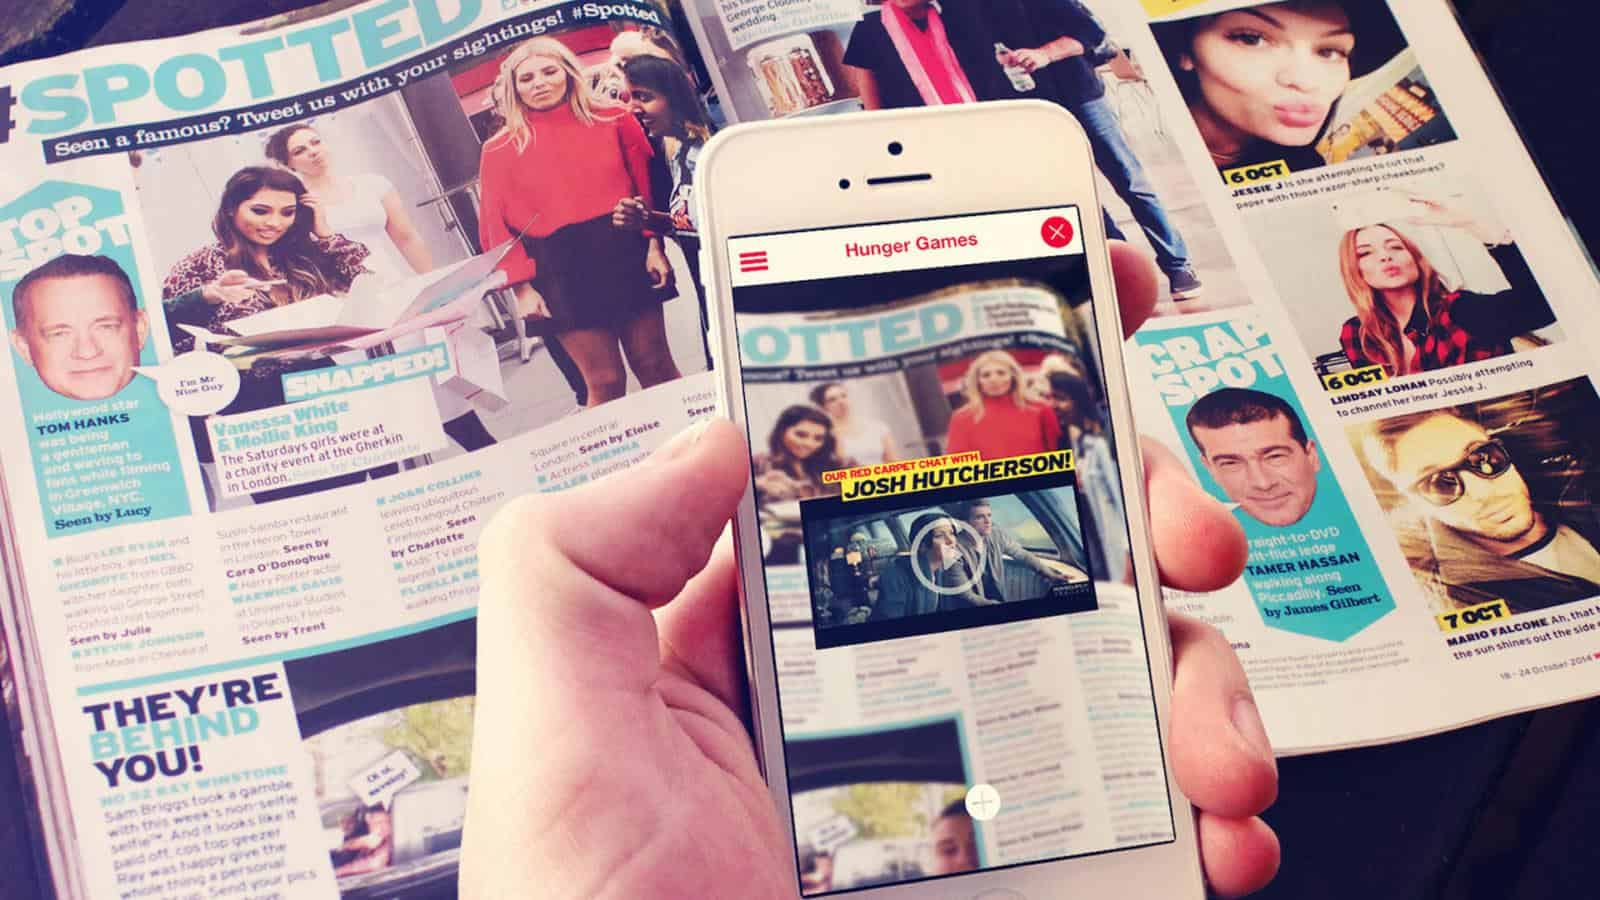 Heat magazine AR app